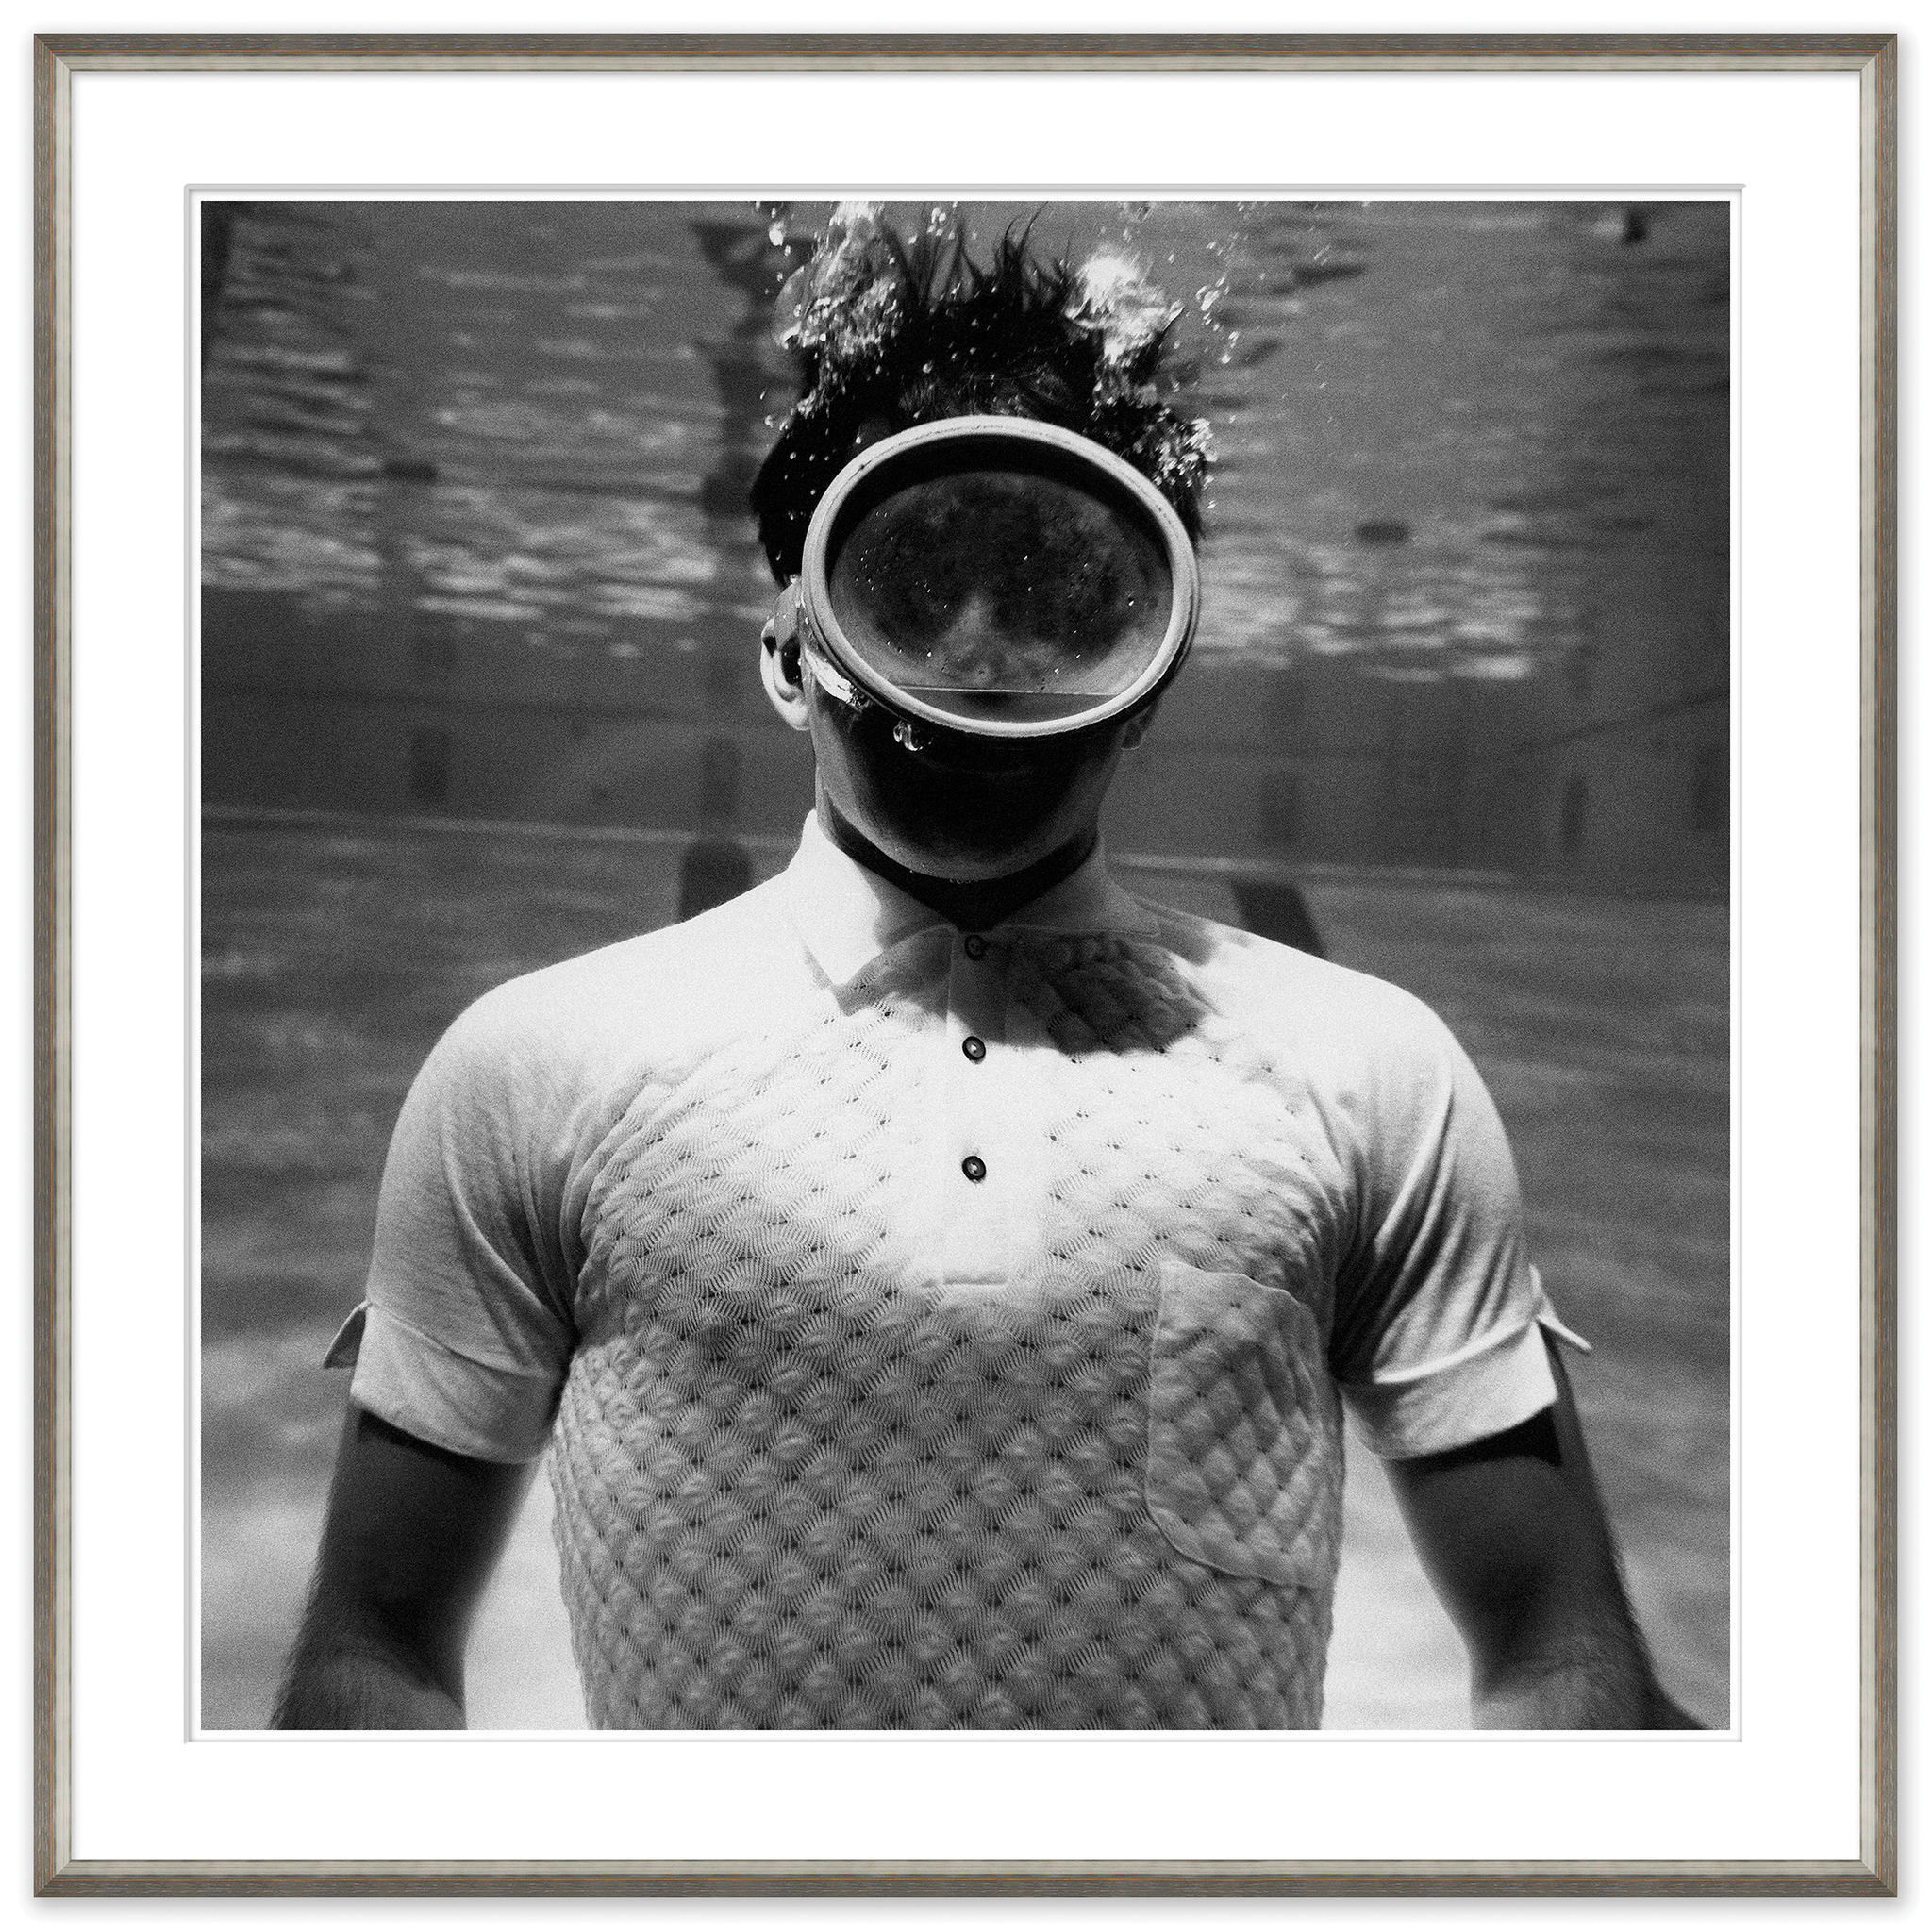 """MAN UNDERWATER"", LEONARD NONES, APRIL 1961"